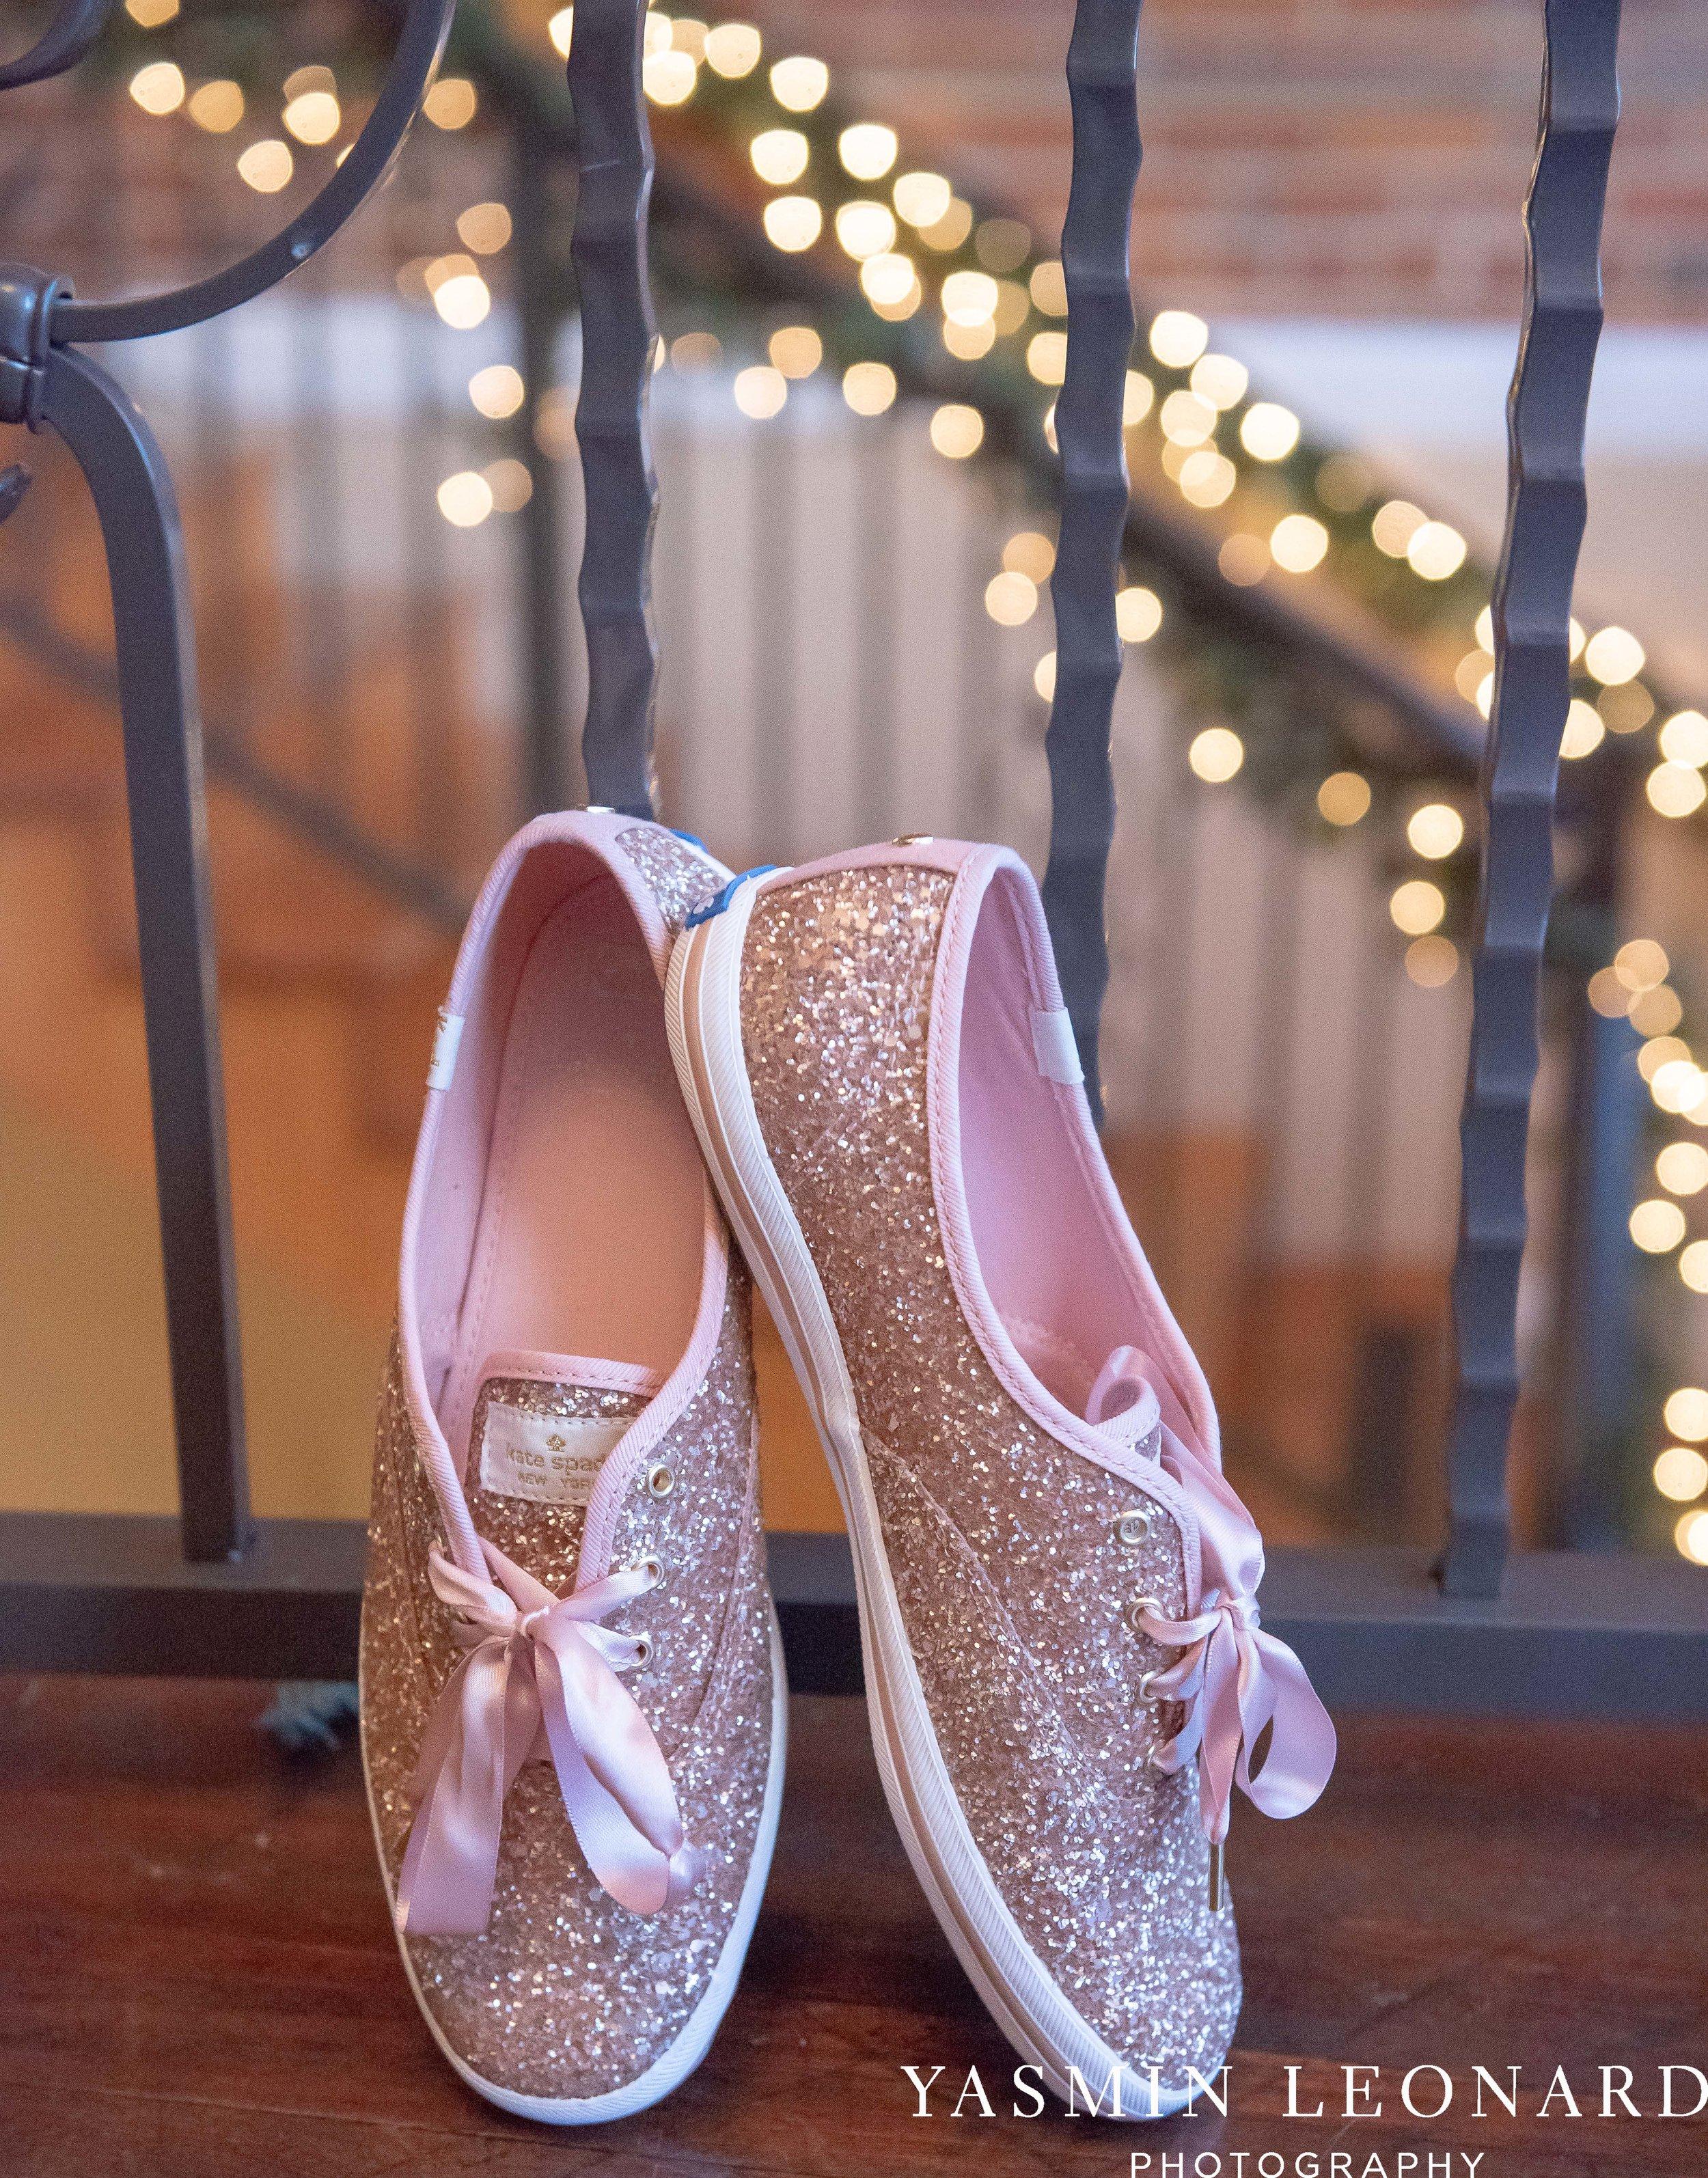 Rebekah and Matt - 105 Worth Event Centre - Yasmin Leonard Photography - Asheboro Wedding - NC Wedding - High Point Weddings - Triad Weddings - Winter Wedding-5.jpg